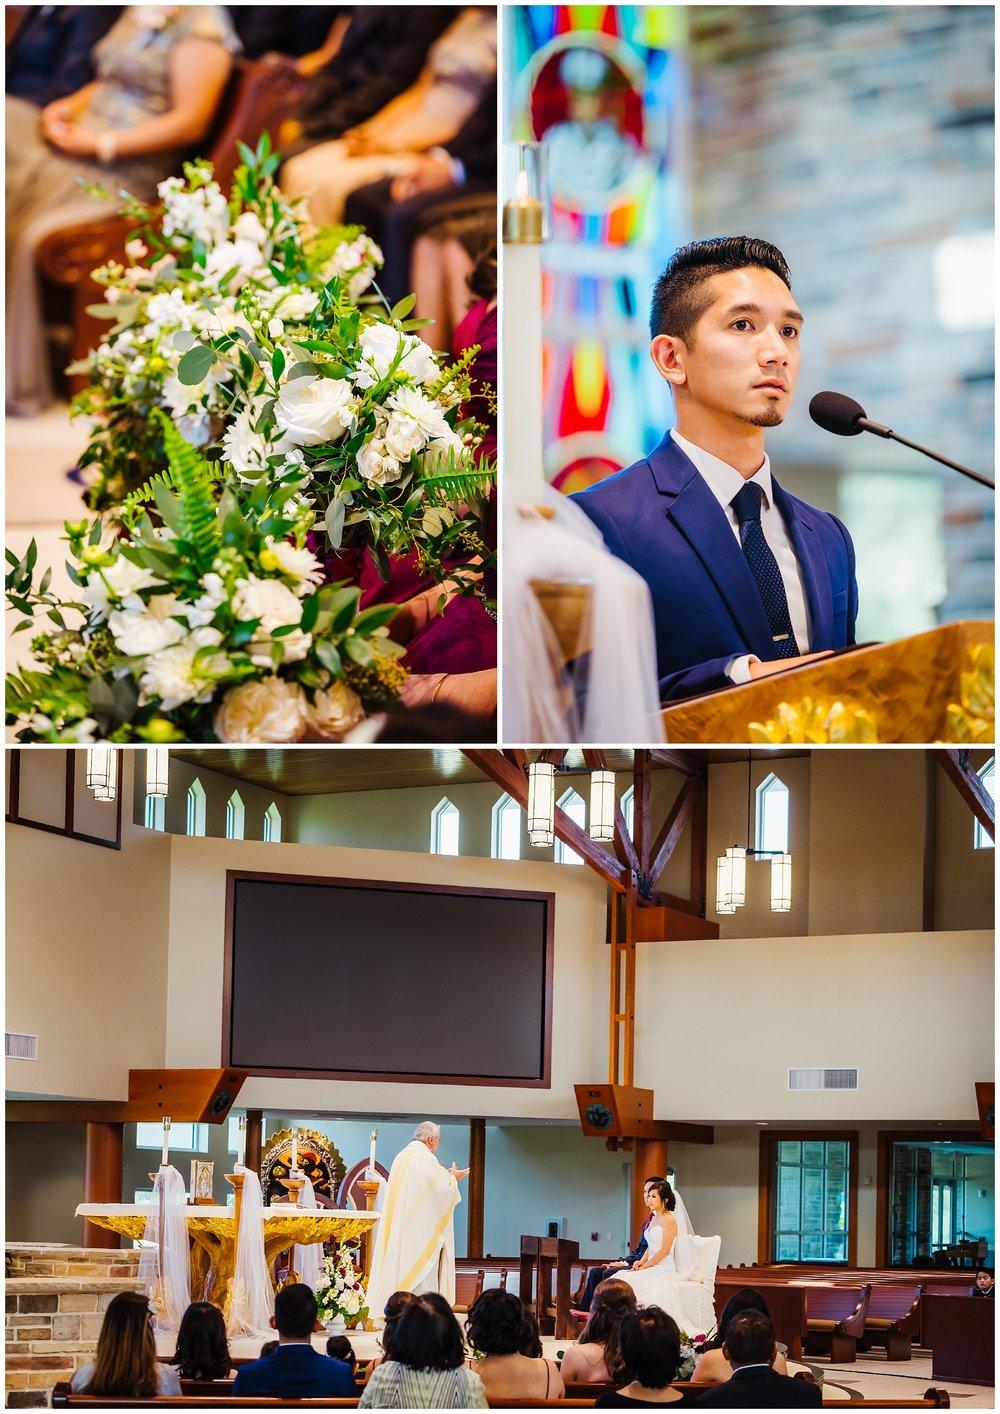 tampa-wedding-photographer-philipino-colorful-woods-ballroom-church-mass-confetti-fuscia_0034.jpg